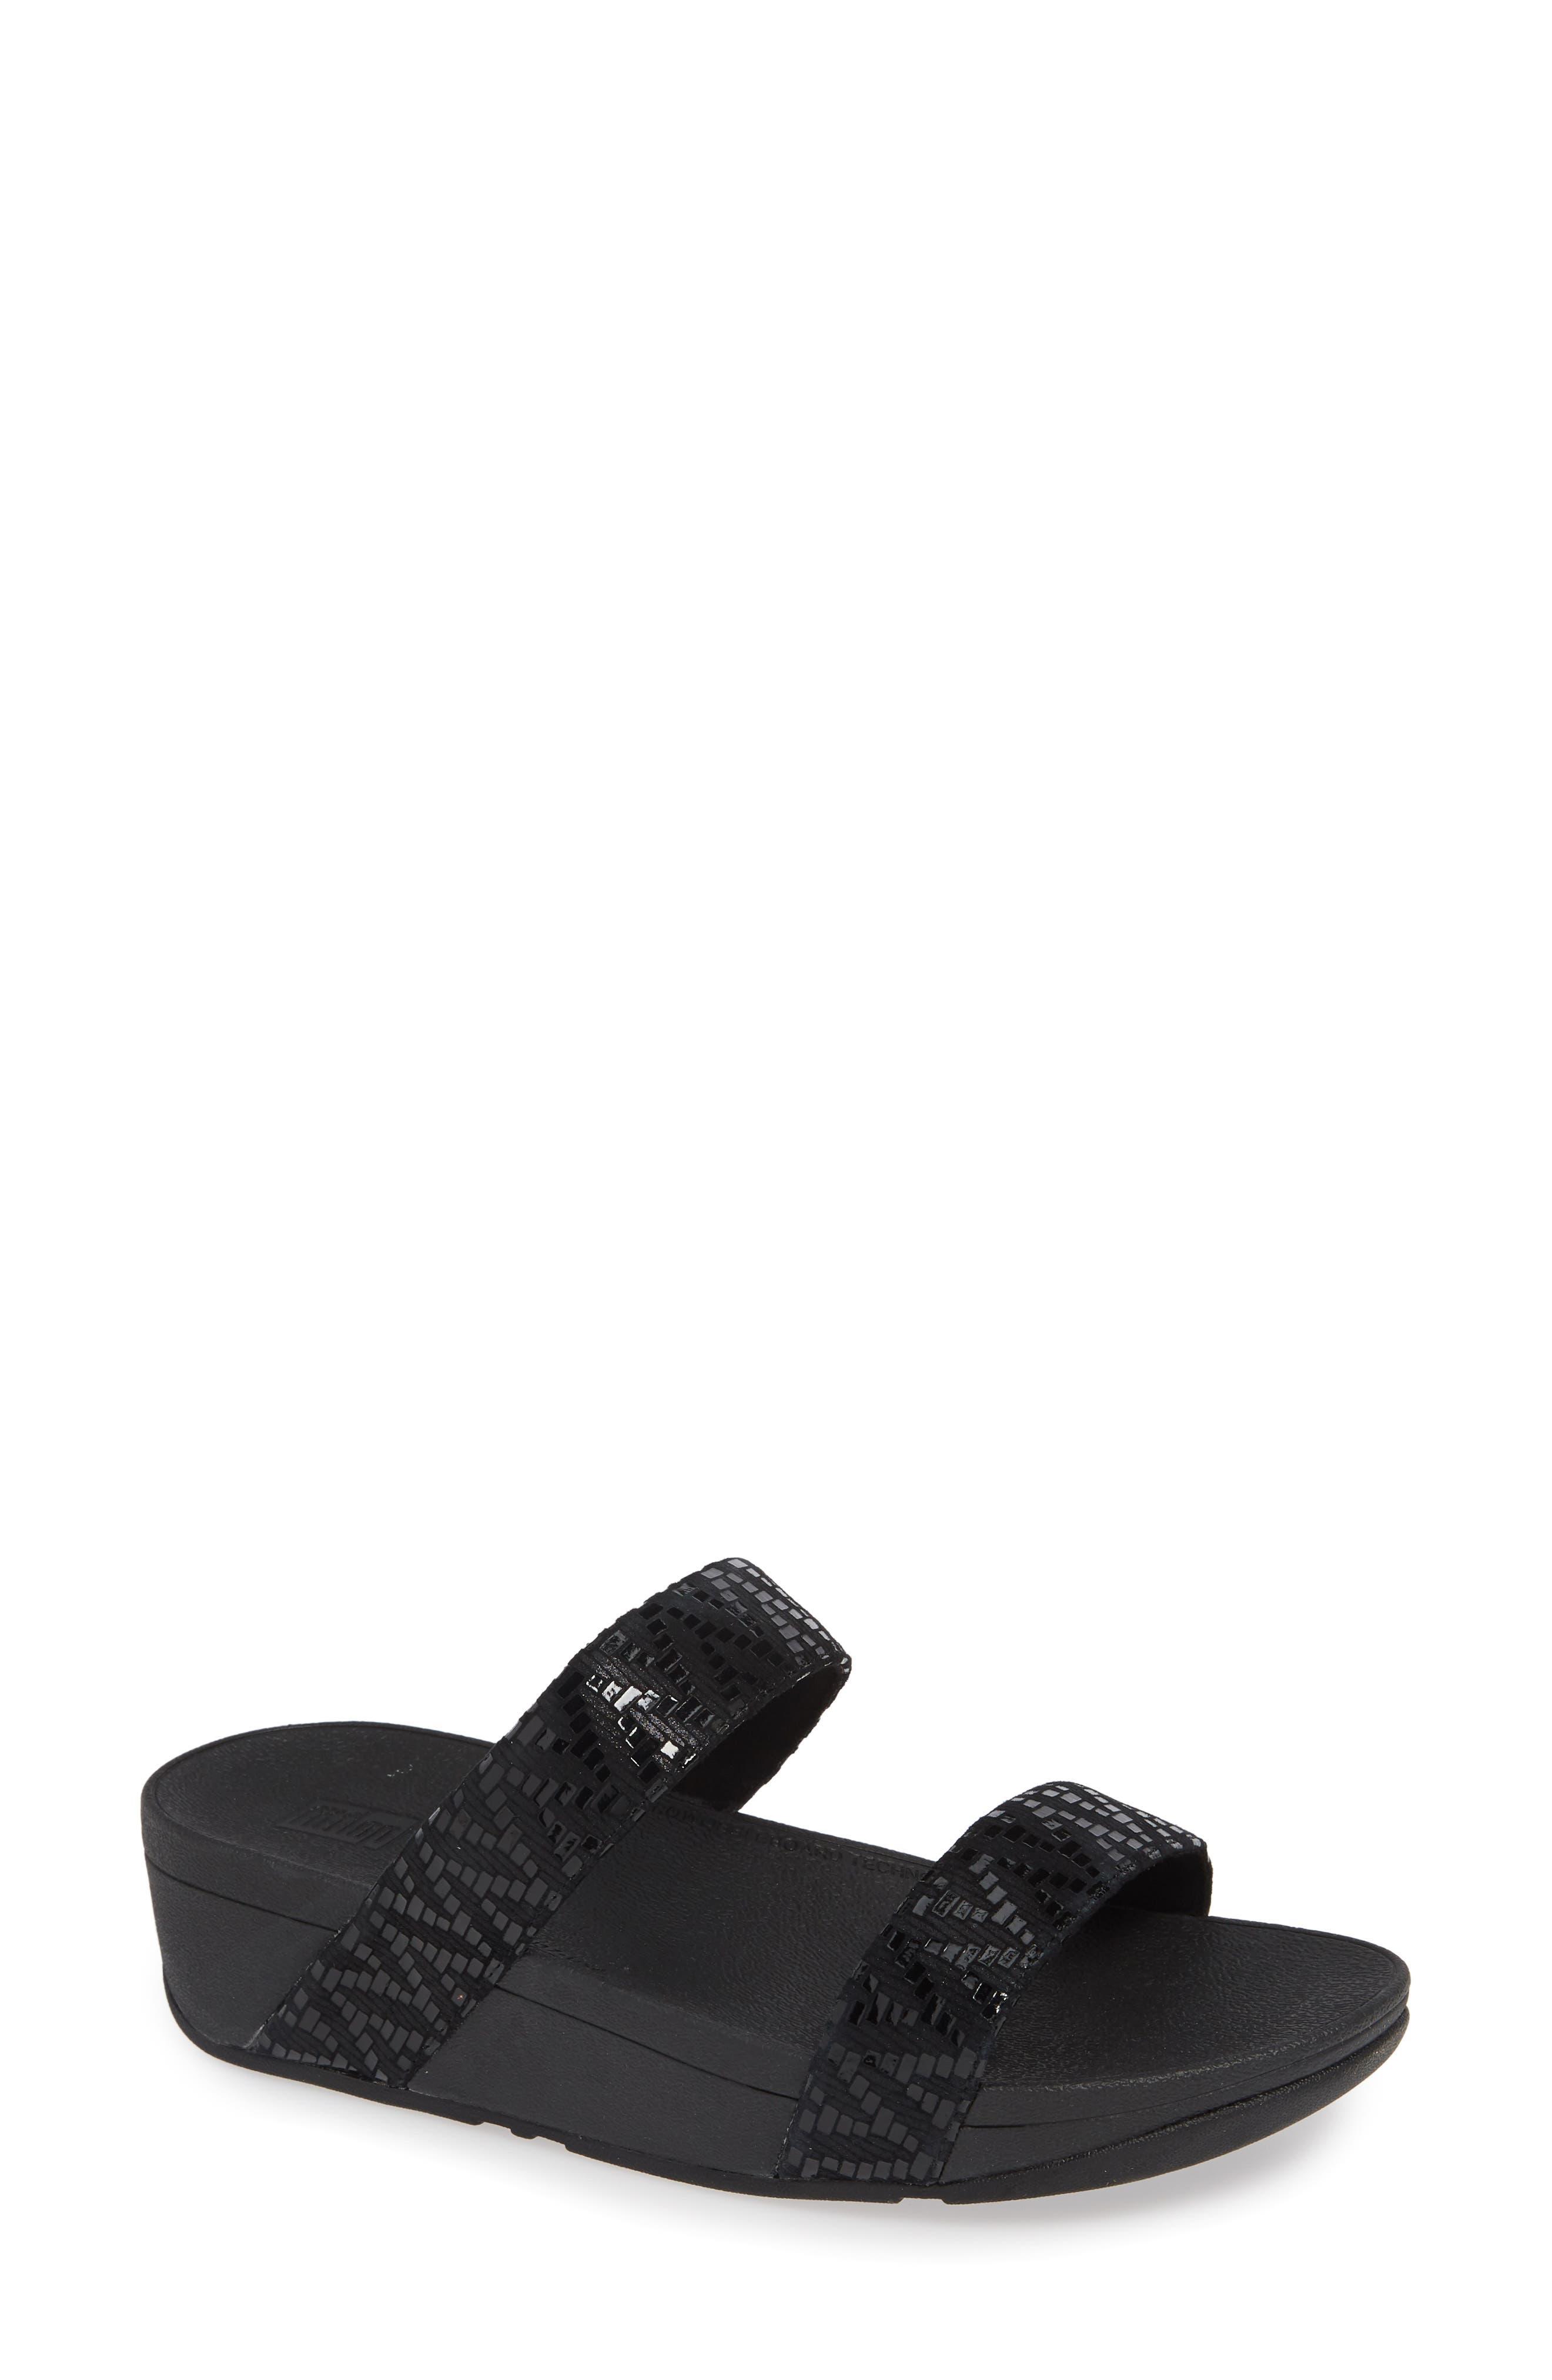 Lottie Chevron Wedge Slide Sandal,                             Main thumbnail 1, color,                             BLACK FABRIC